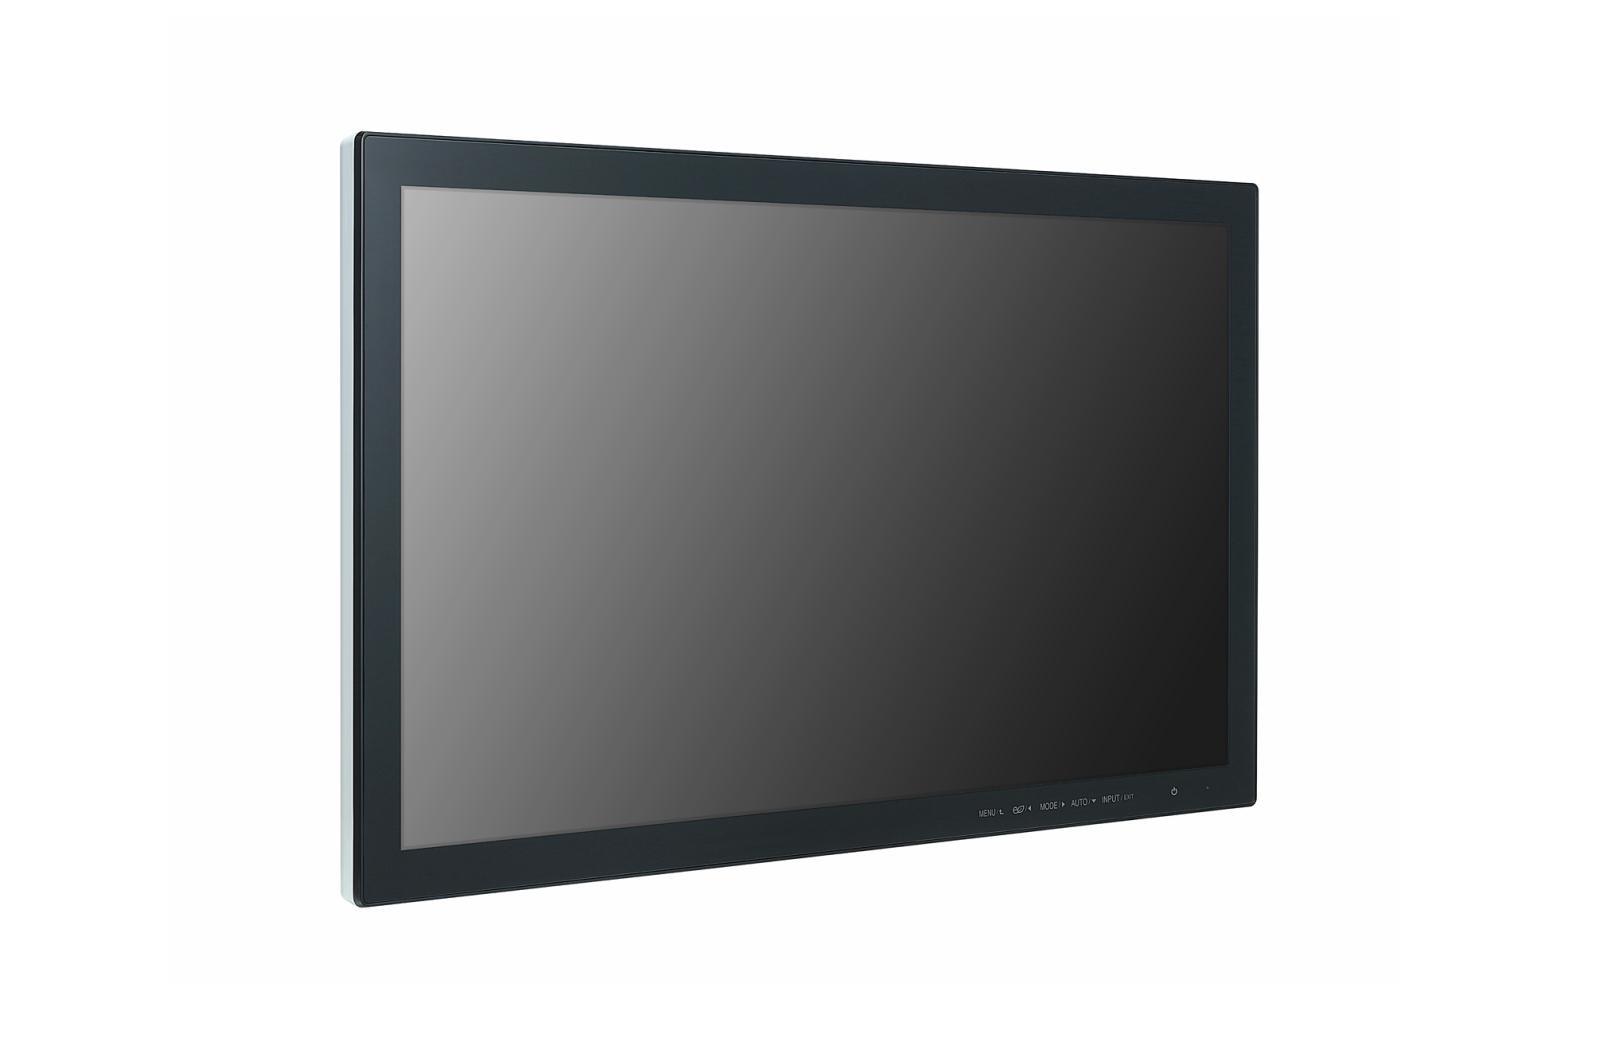 "Ecran Interactiv Monitor Touch LG, 23"" (58cm), FHD, Operare 16/7, Luminozitate 250nit, Timp Raspuns 5ms, [...]; Conectivitate: INPUT: 1xD-SUB, 1xHDMI, 1xUSB; OUTPUT: Headphone; Landscape/Portrait, VESA 75x75, Dimensiuni 555×335×53mm, Greutate 3.9kg, Consum max 25W. - imaginea 1"